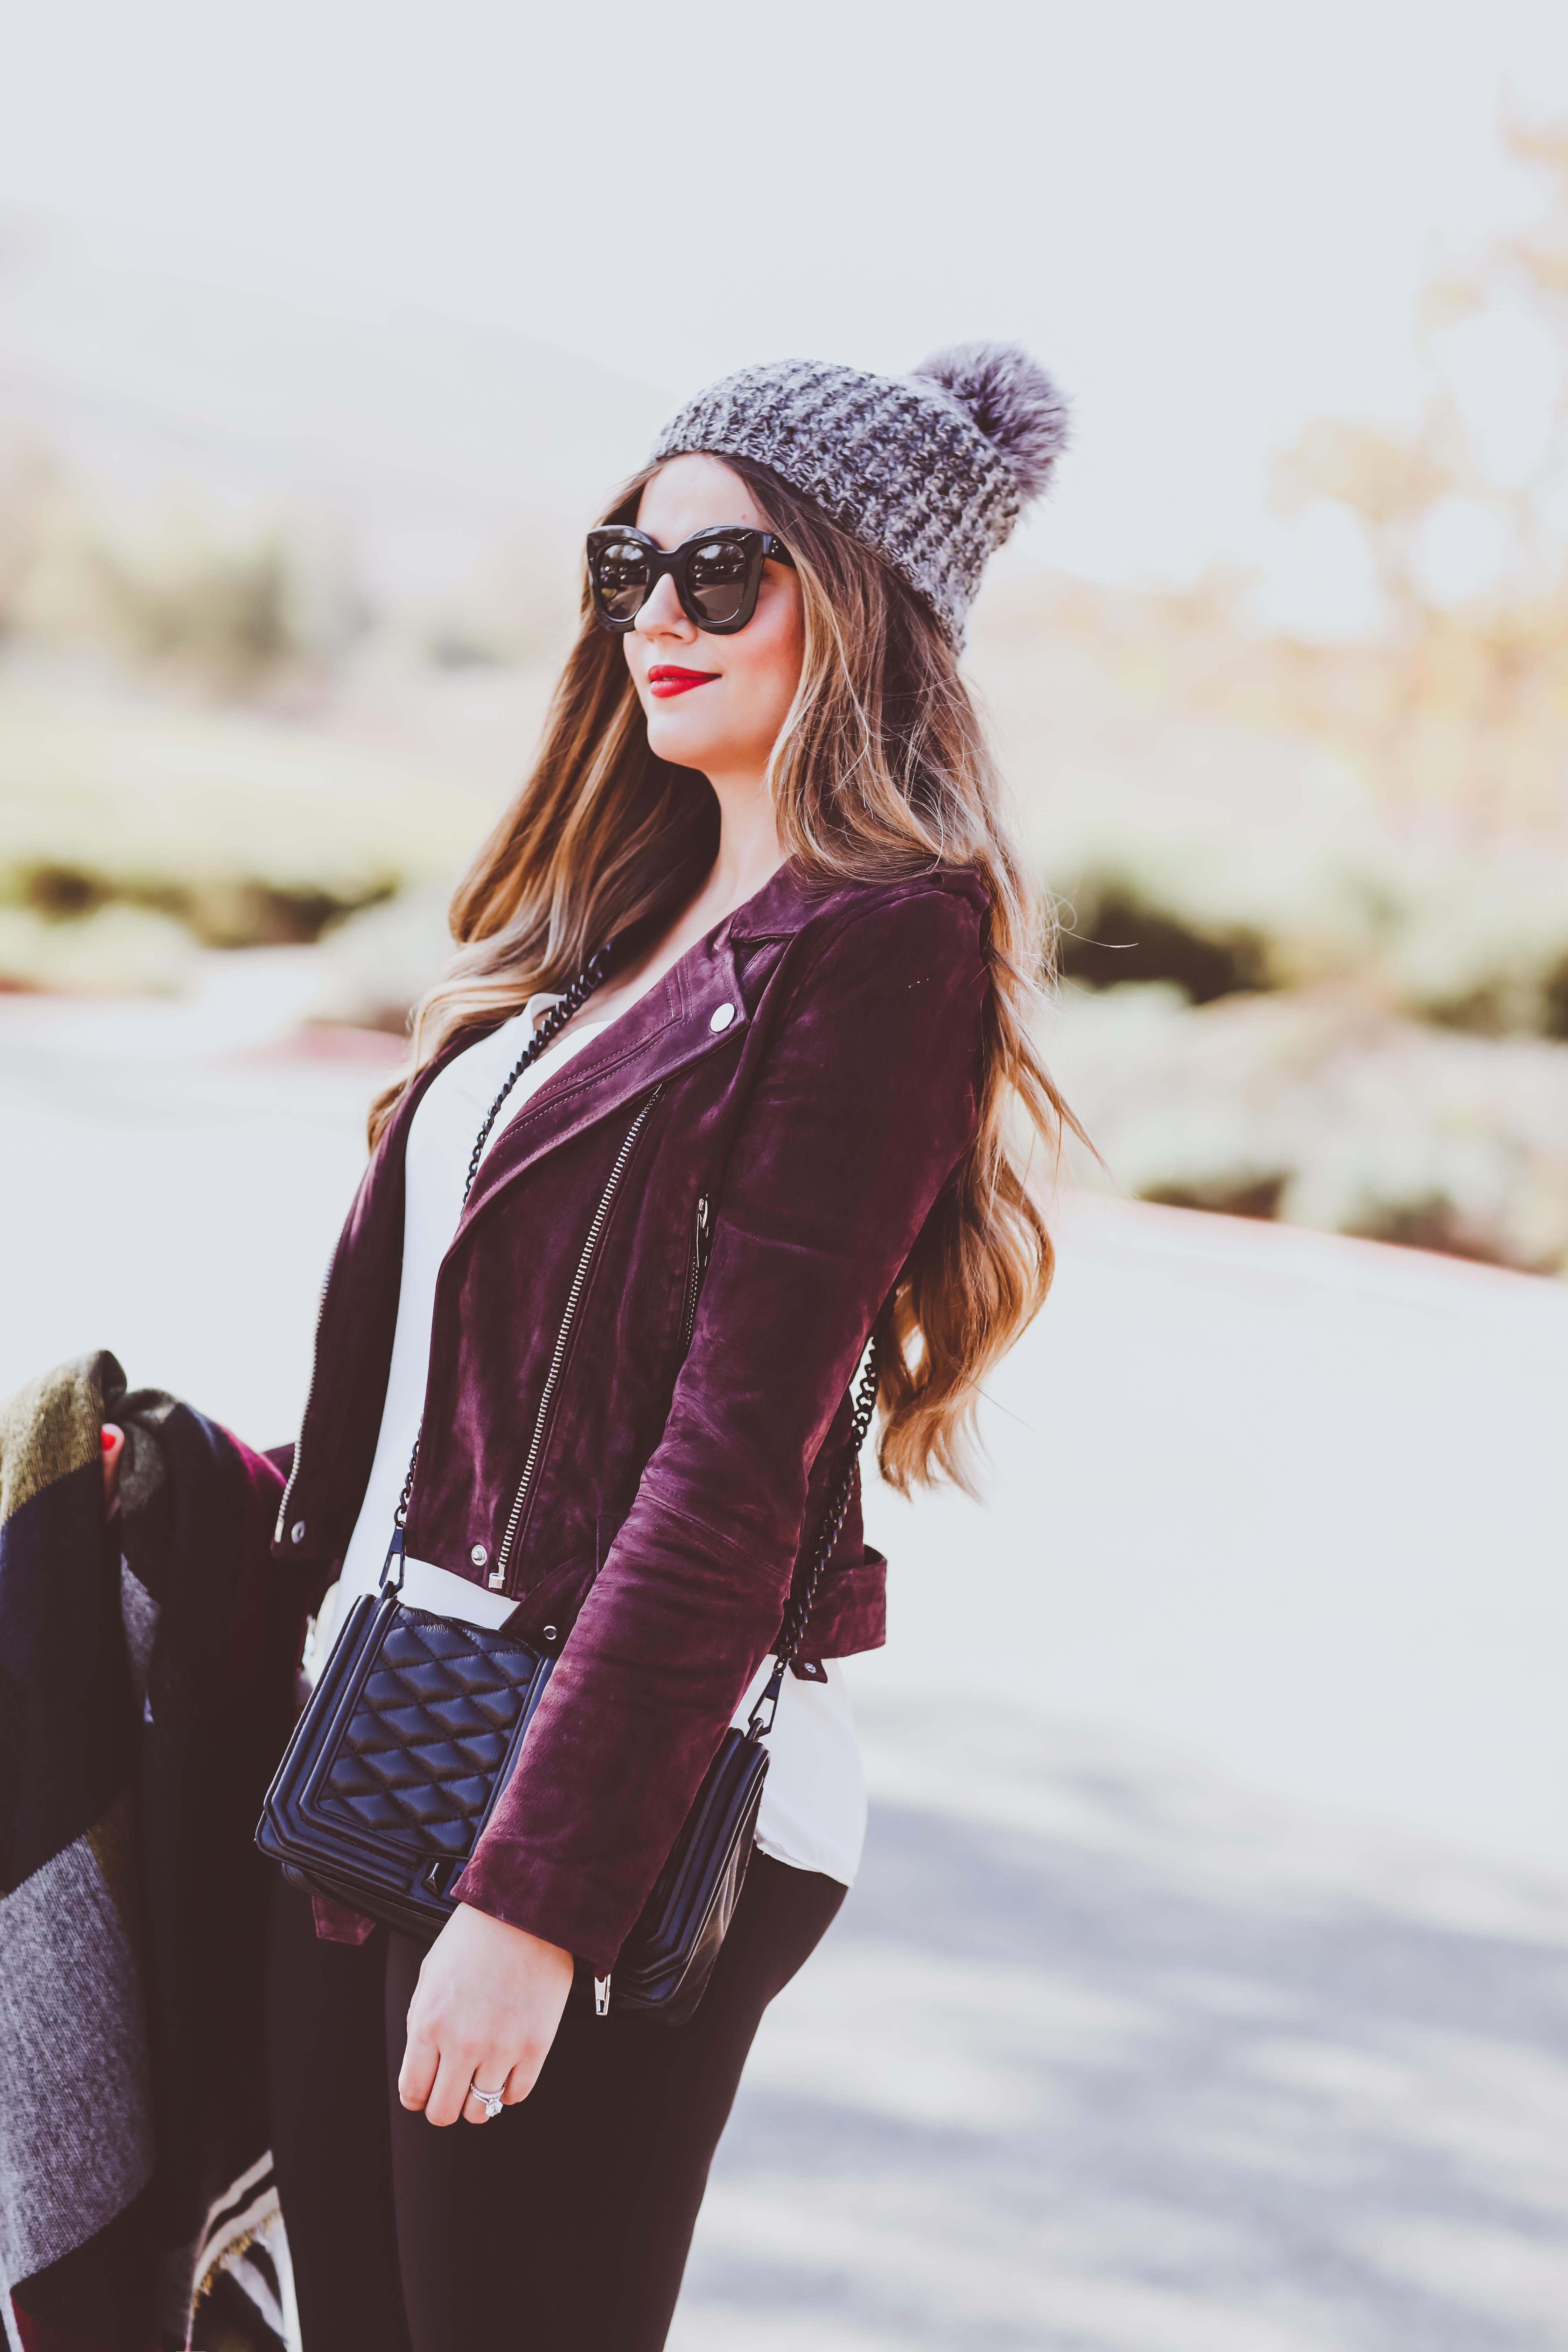 blanknyc burgundy suede moto jacket, grey fur pom beanie, bp blanket scarf, rebecca minkoff love crossbody bag, belly bandit mother tucker leggings, stuart weitzman black suede highland otk boots, winter outfit, winter fashion